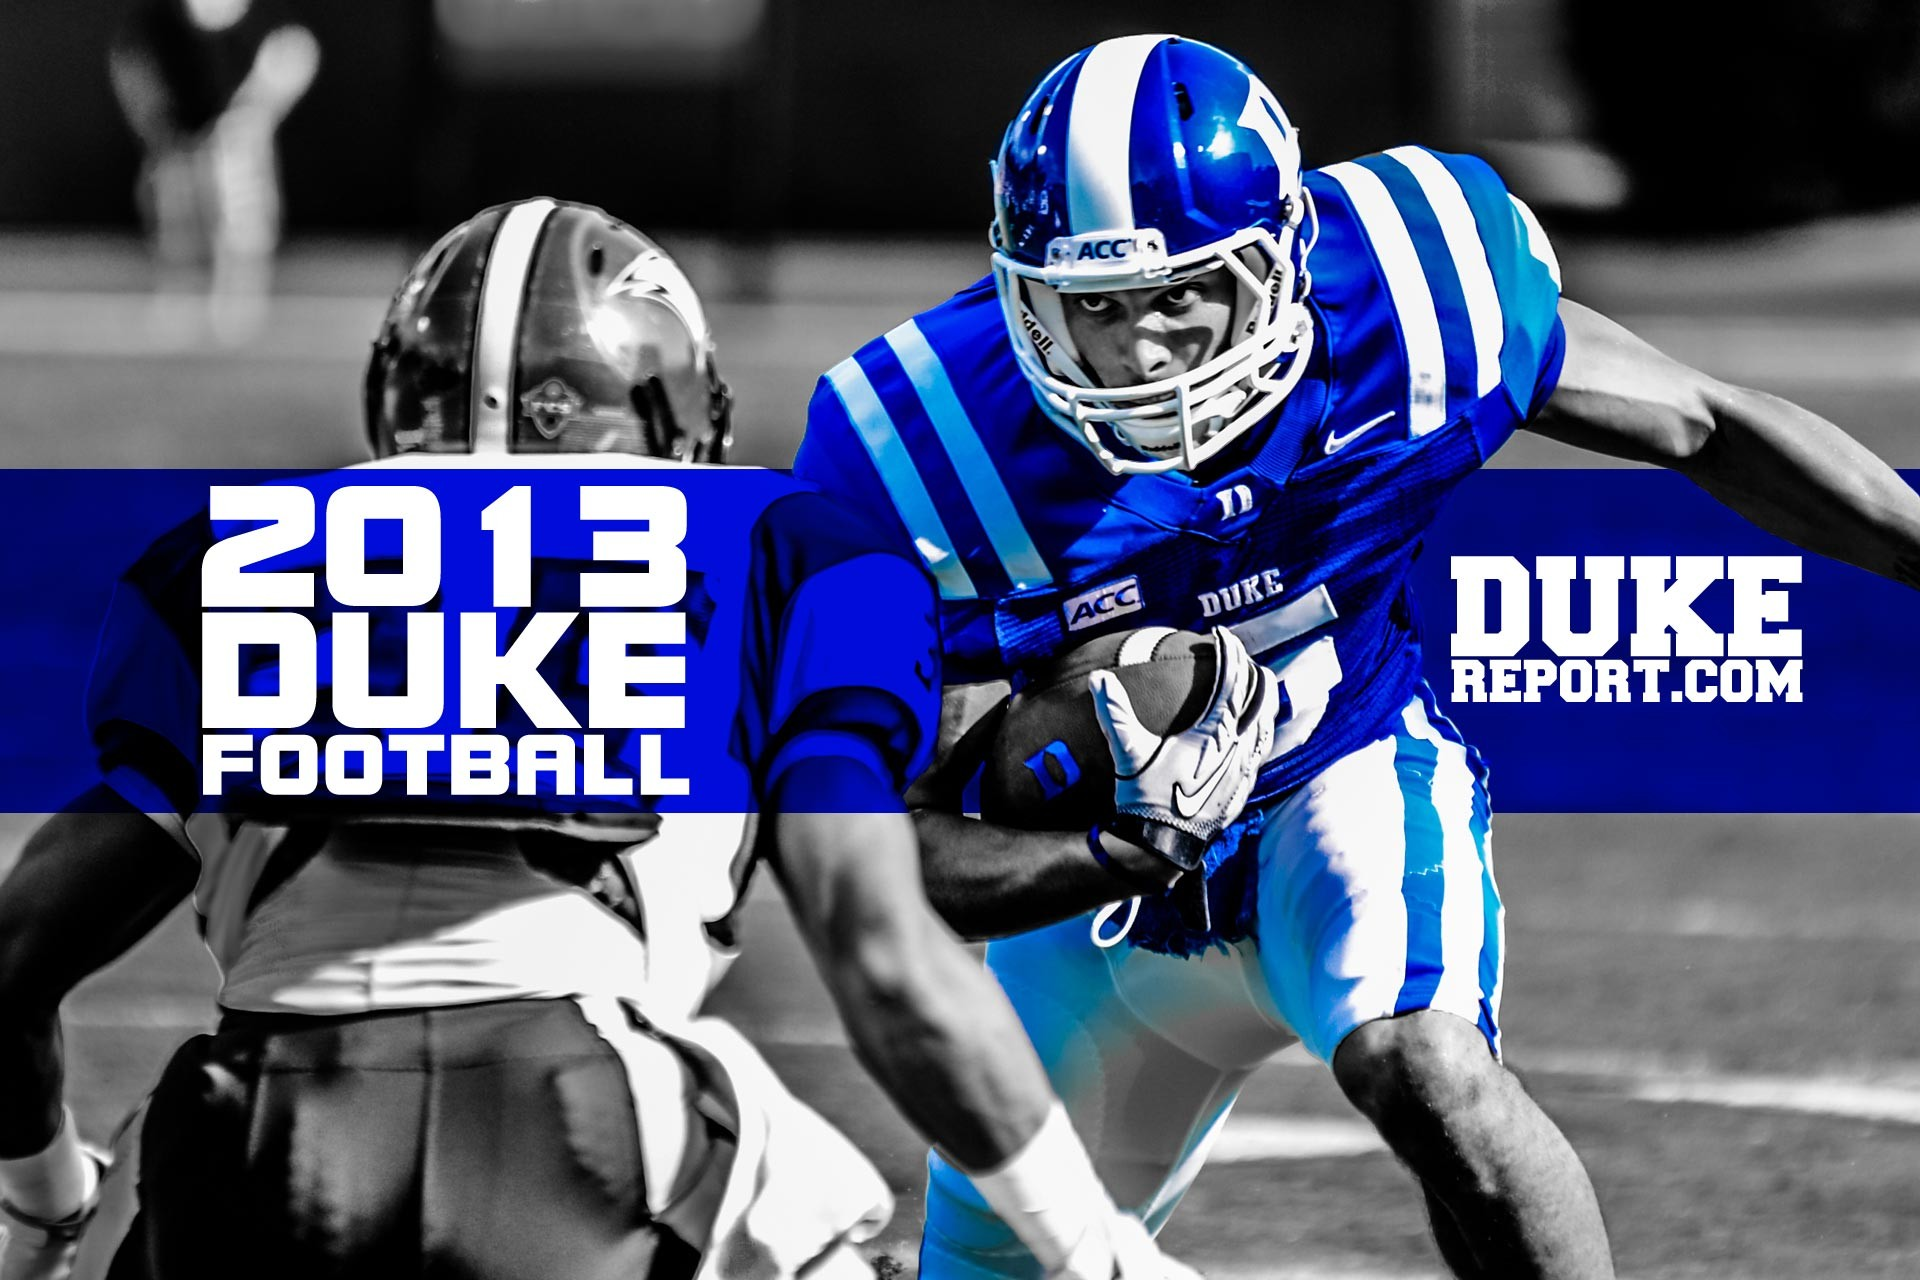 Duke Basketball Wallpaper Iphone 5 Duke football wallpapers